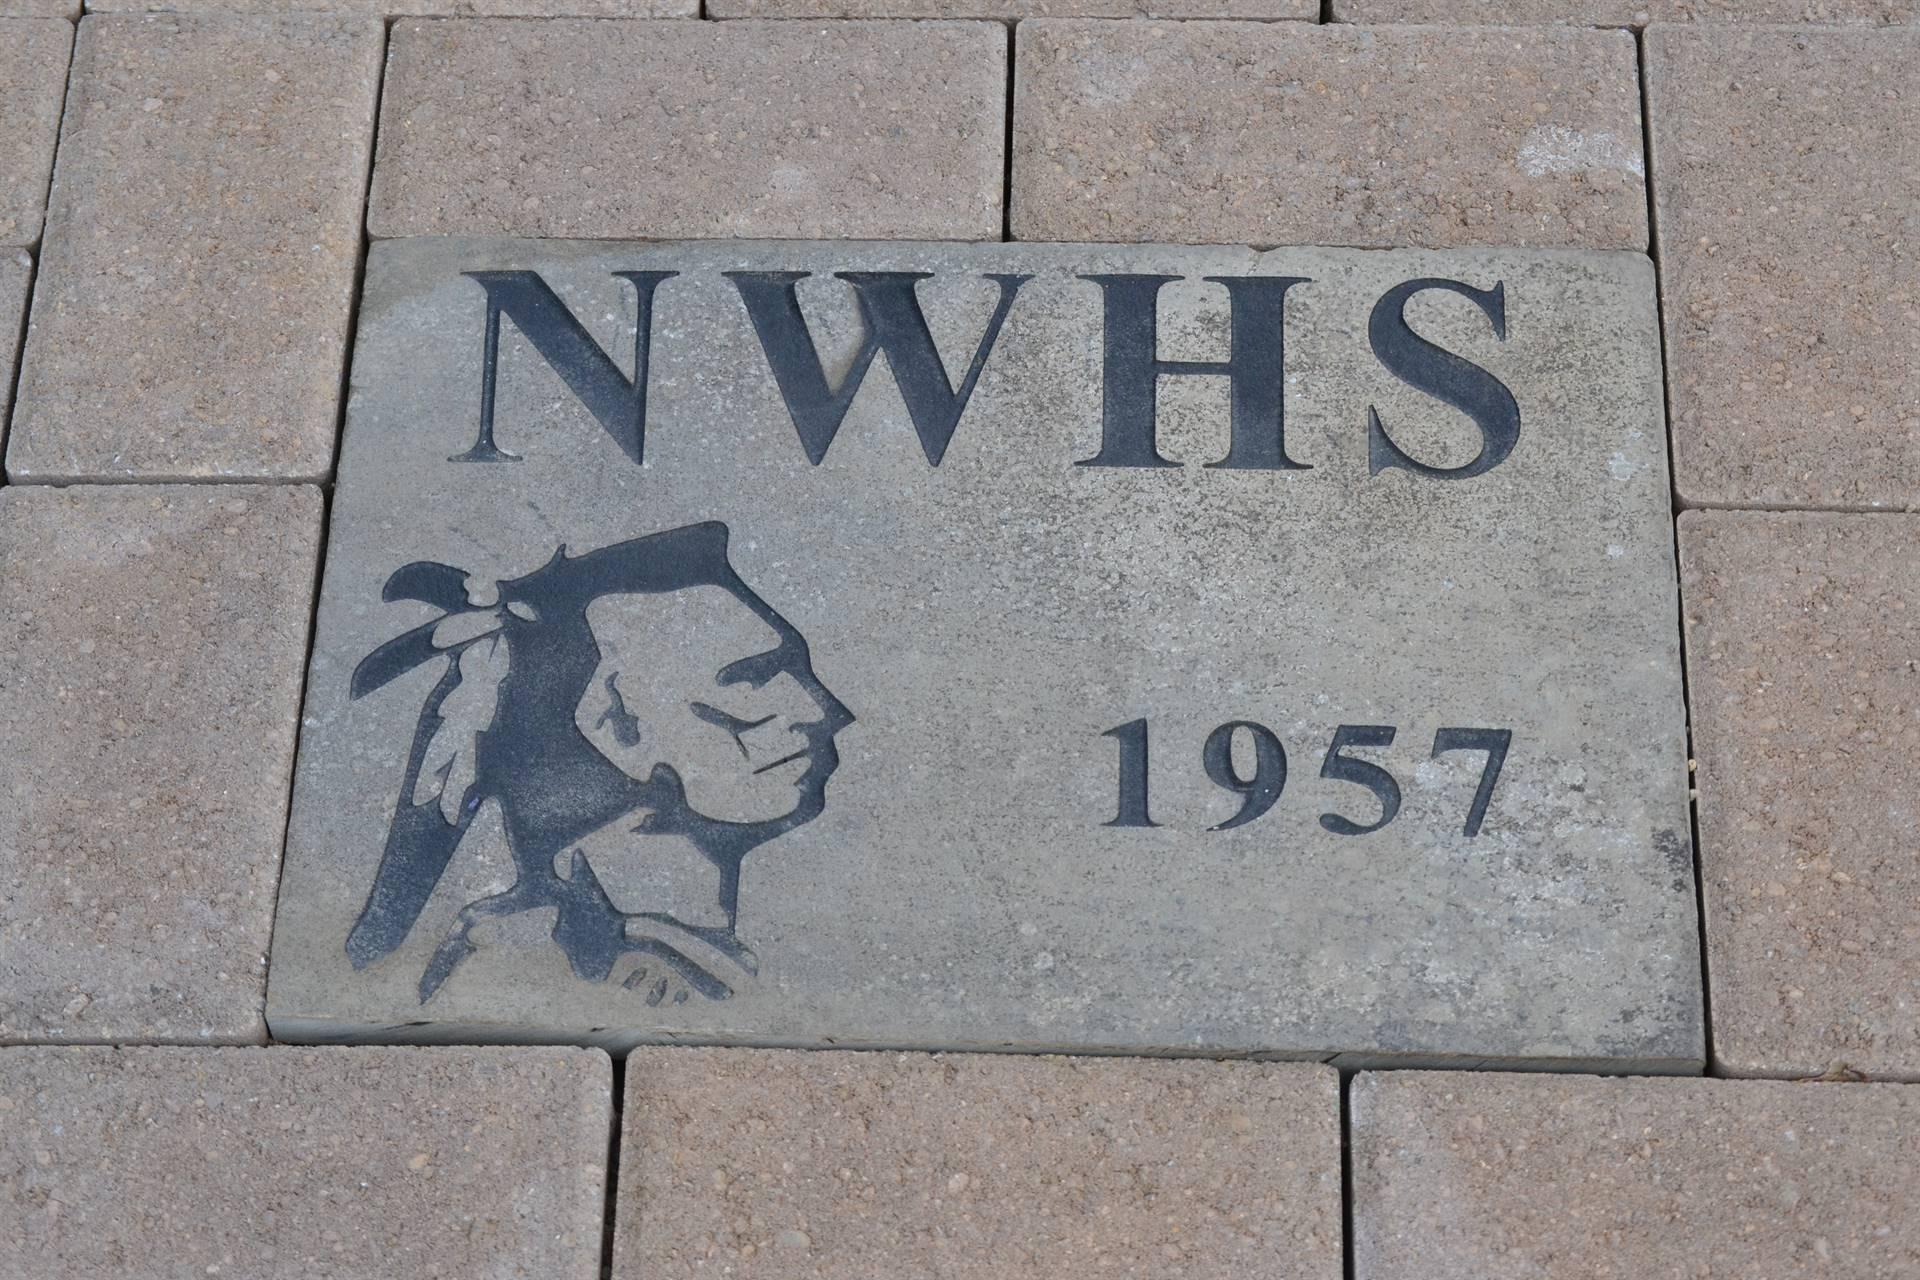 NWHS 1957